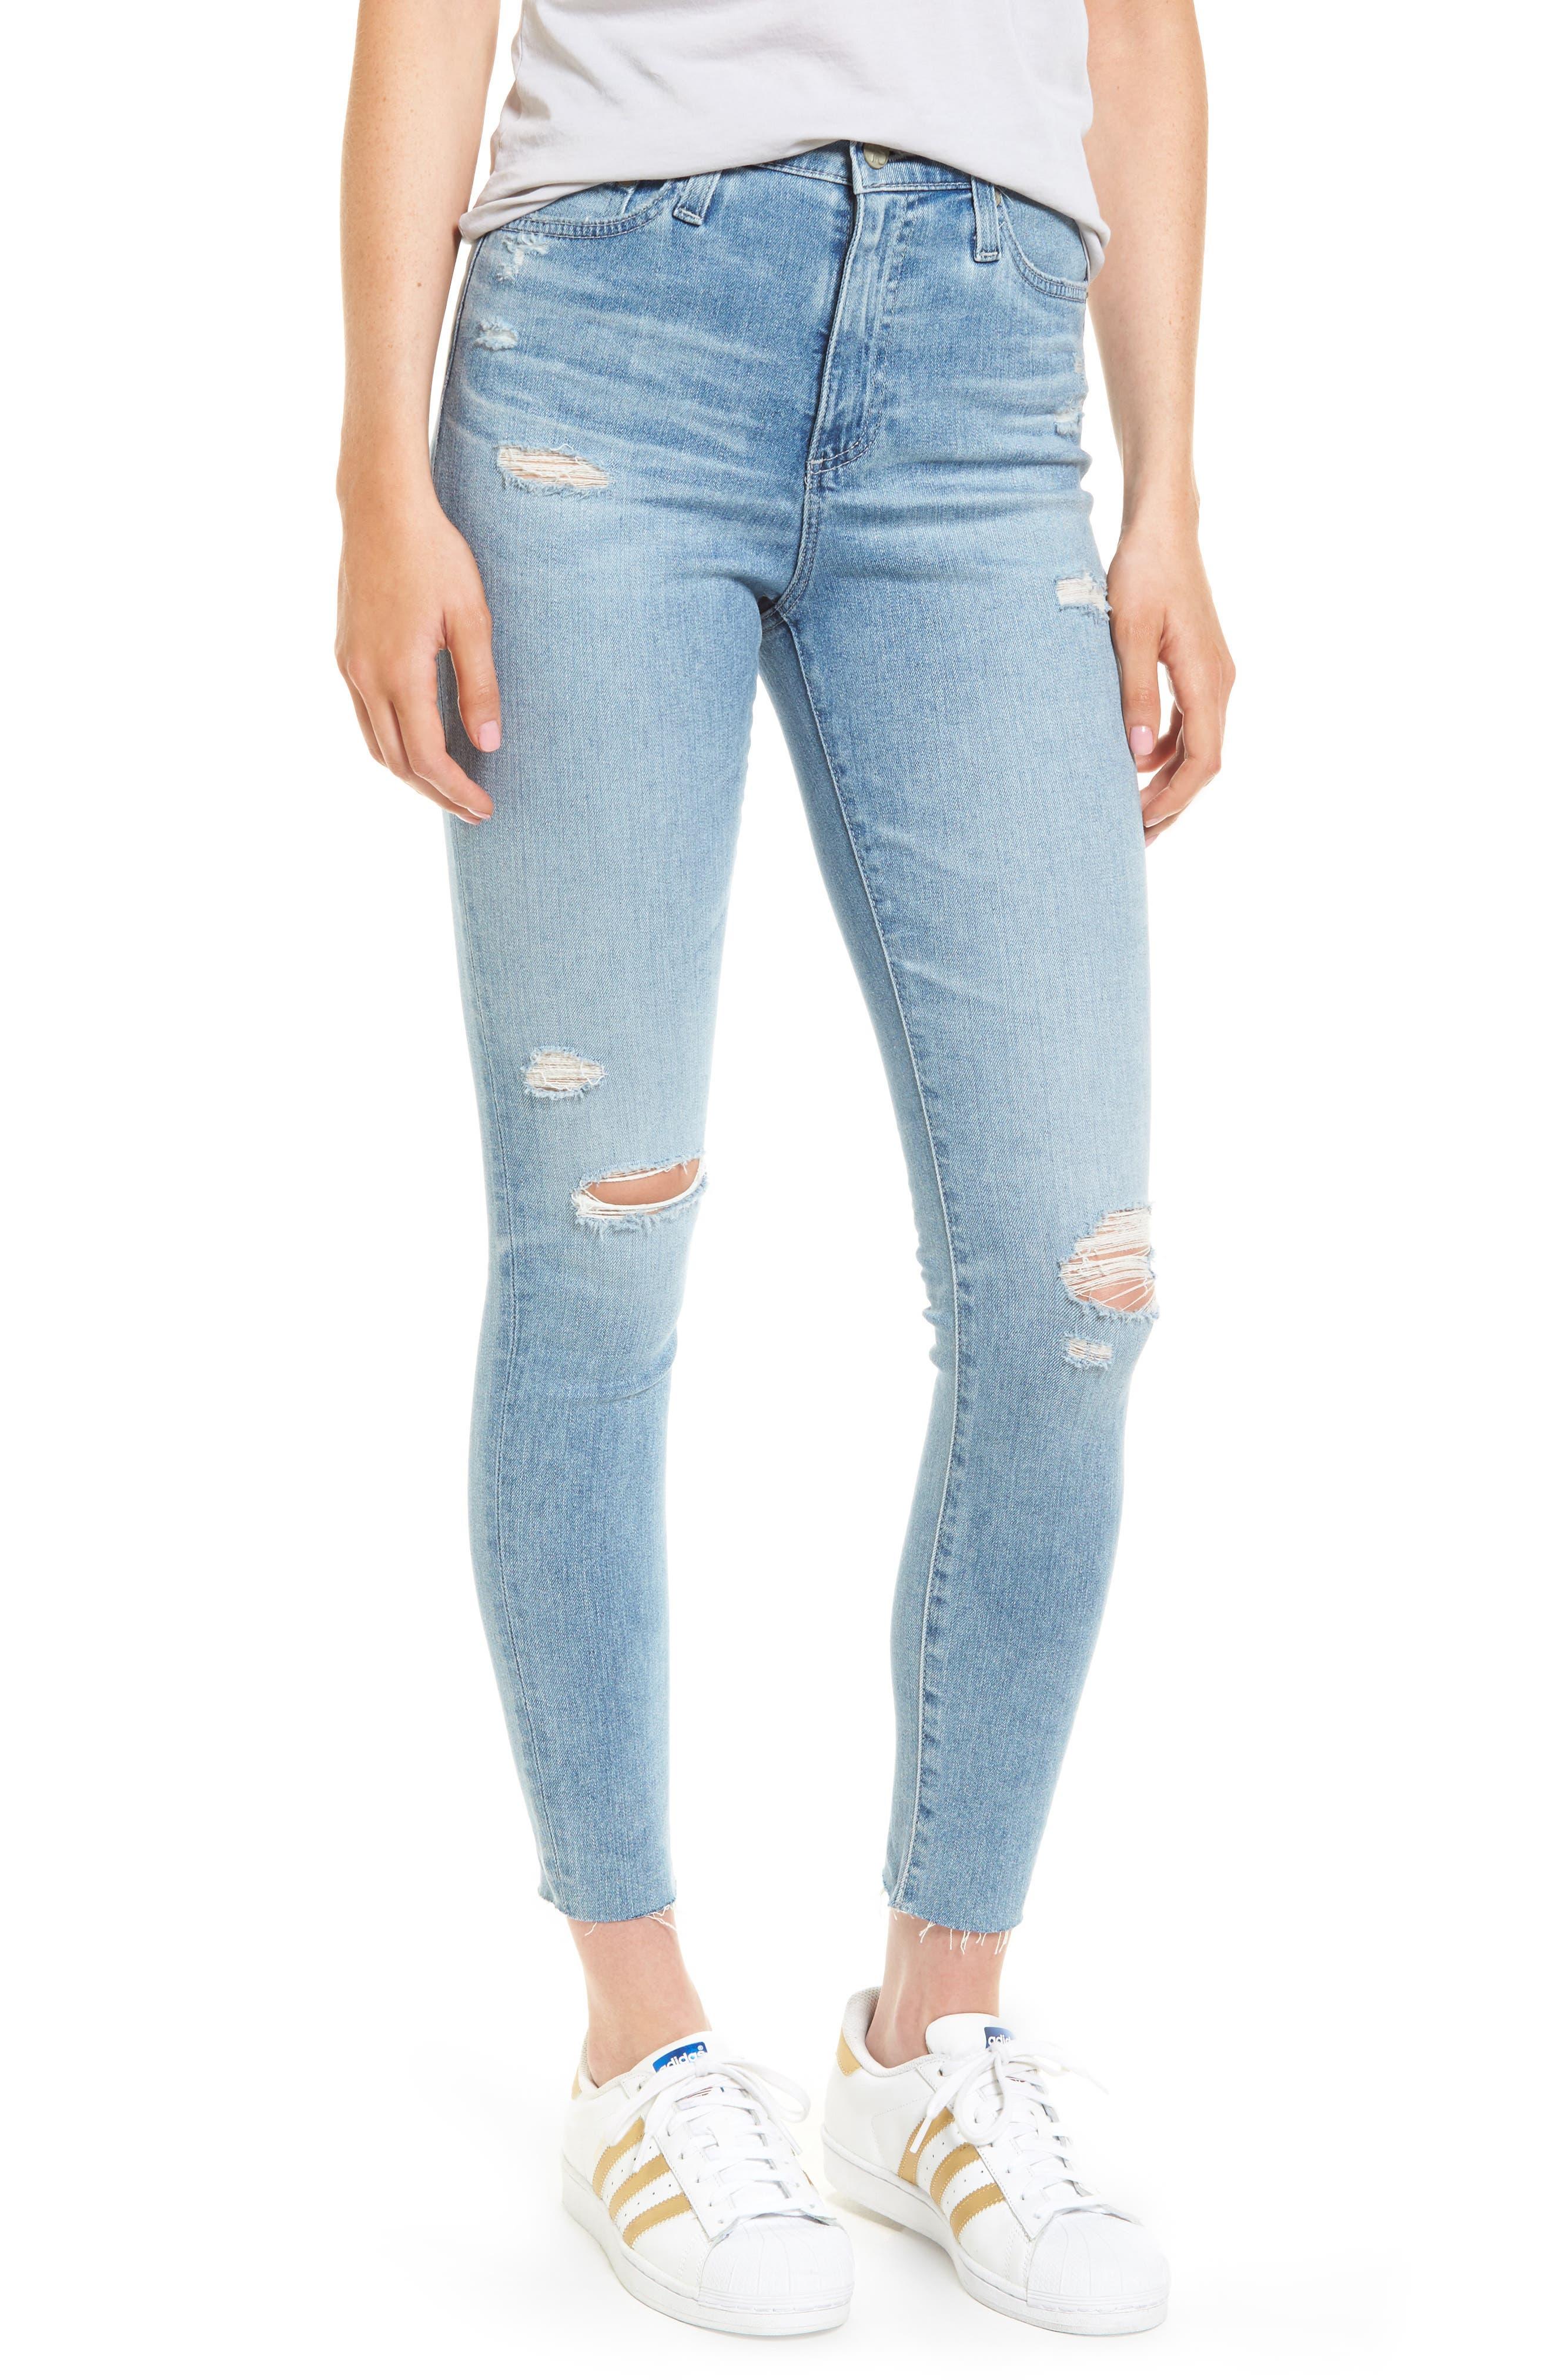 Mila High Waist Ankle Skinny Jeans,                         Main,                         color, 426